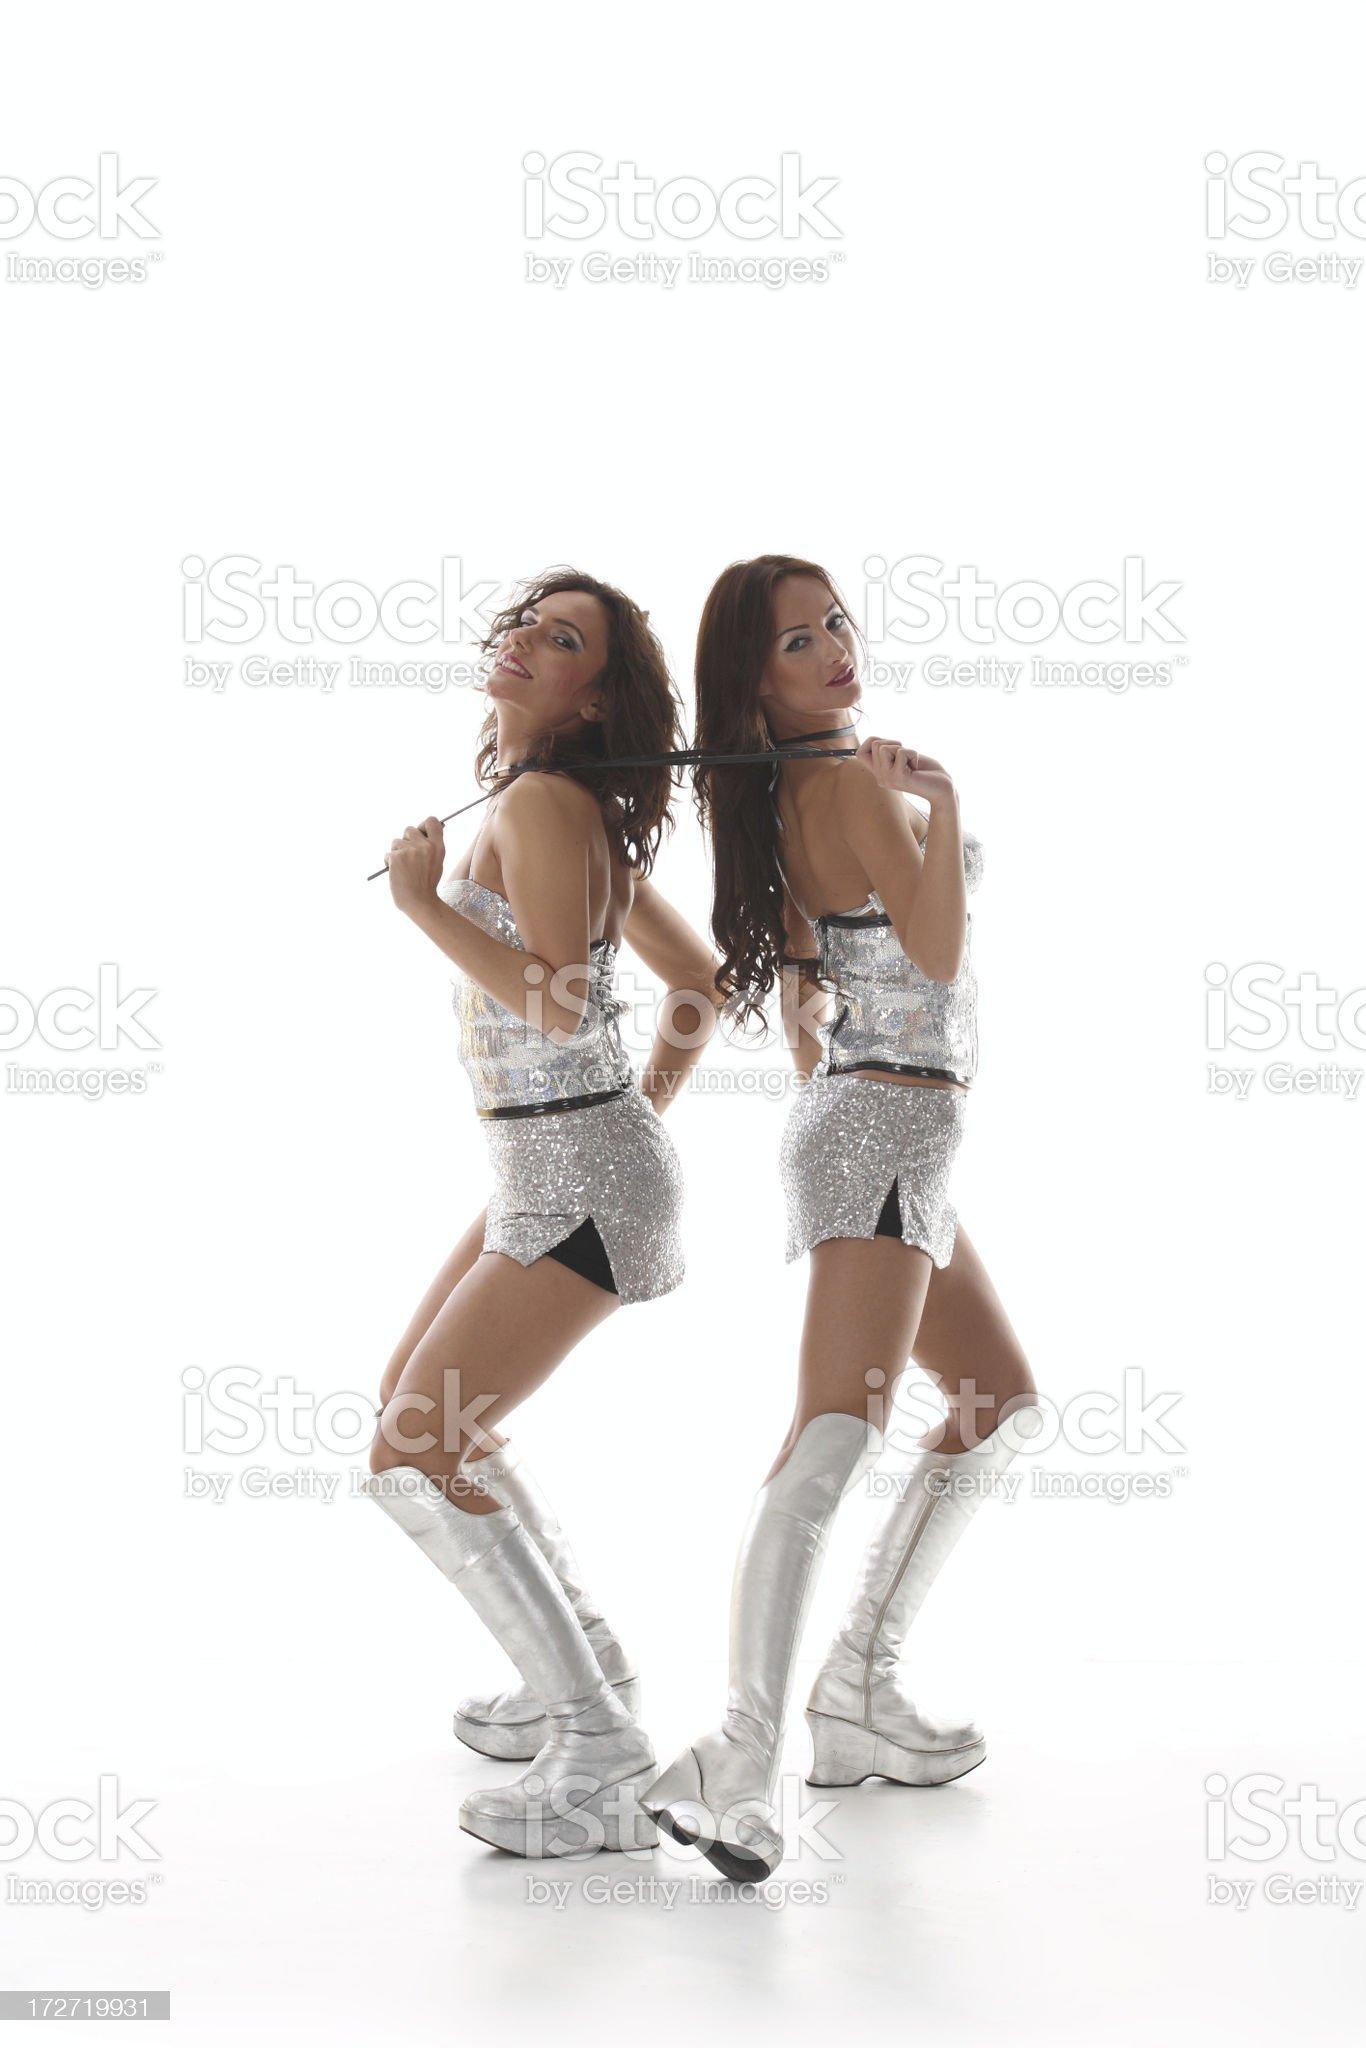 Club Dancers royalty-free stock photo